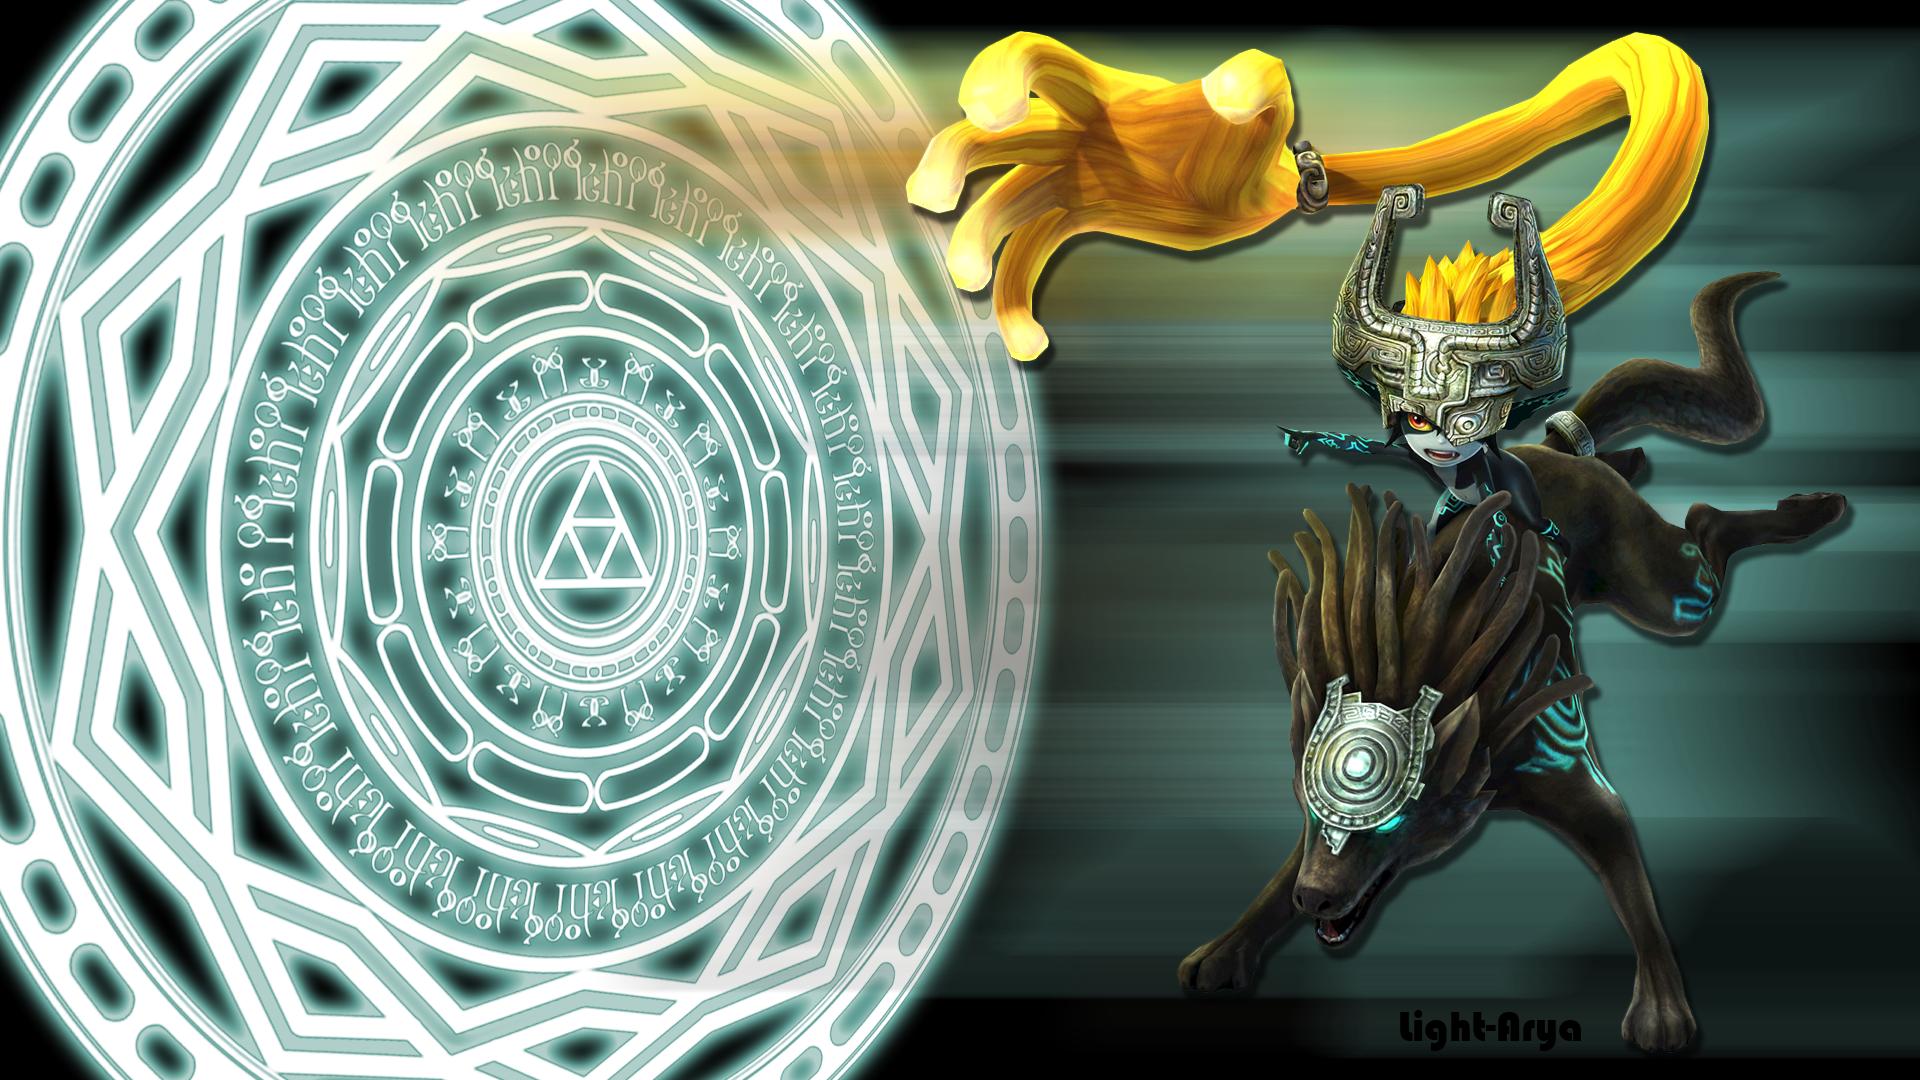 Midna - Hyrule Warriors by Light-Arya